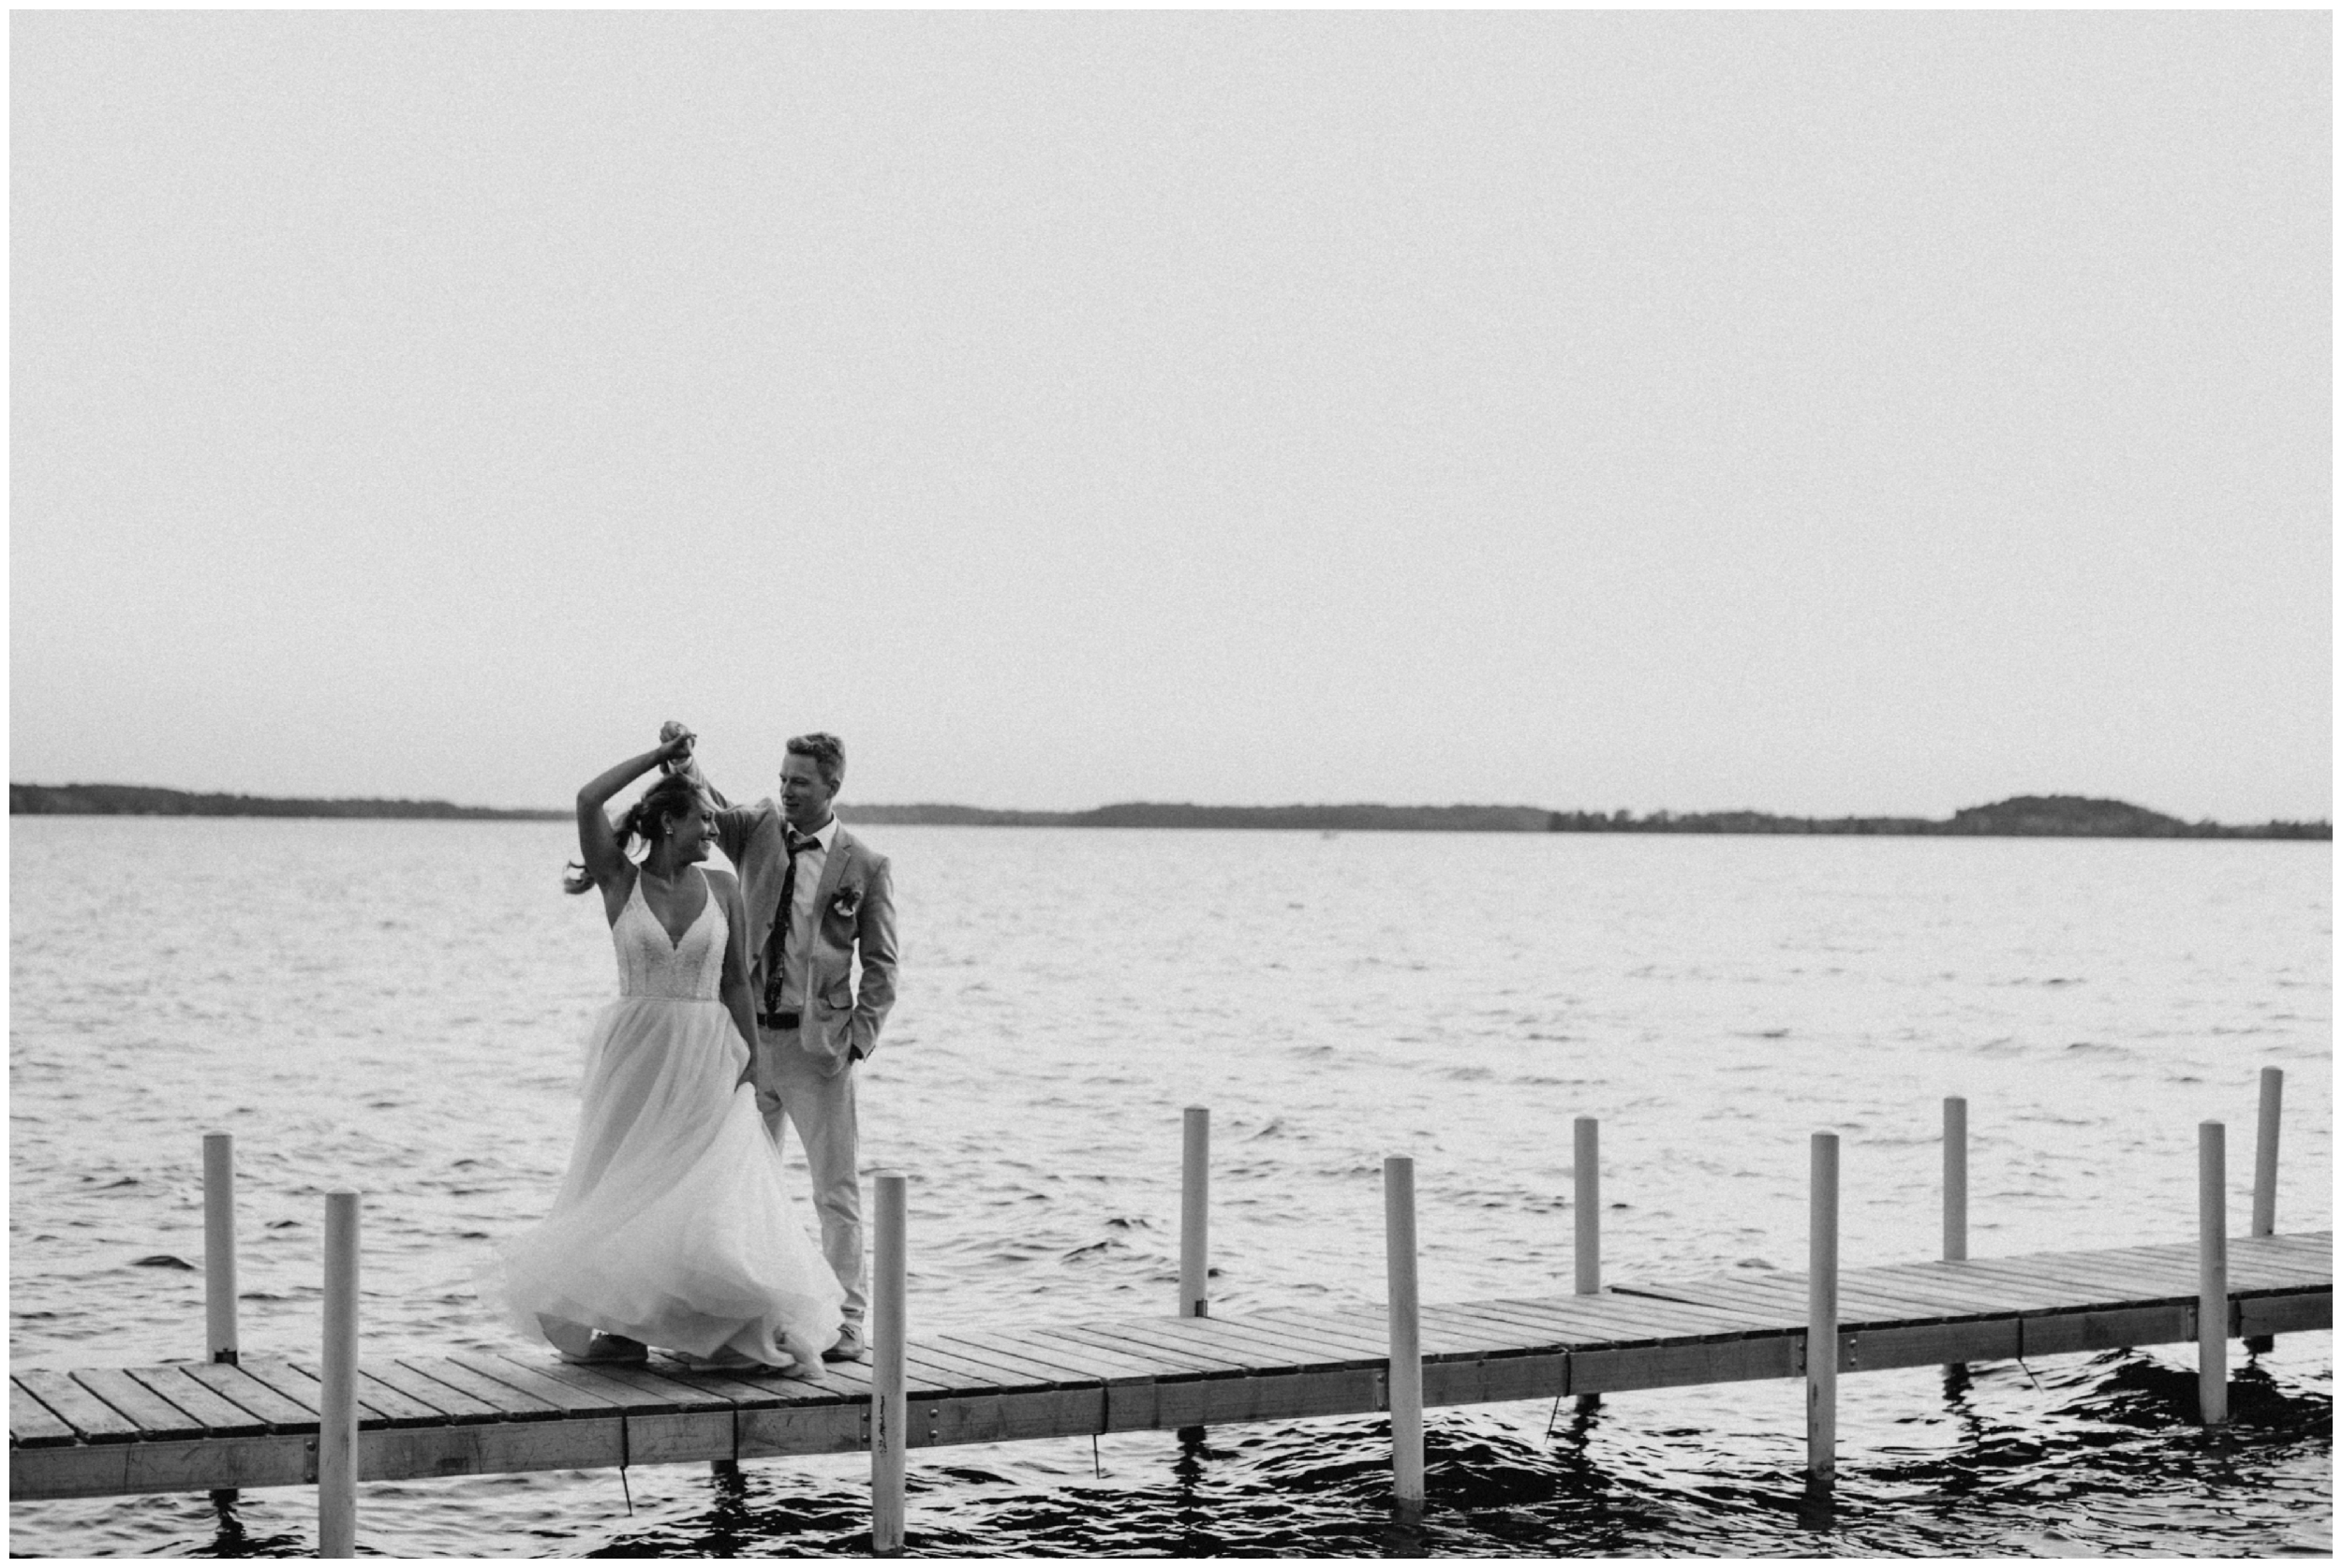 Summer camp wedding on Crosslake Minnesota photographed by Britt DeZeeuw